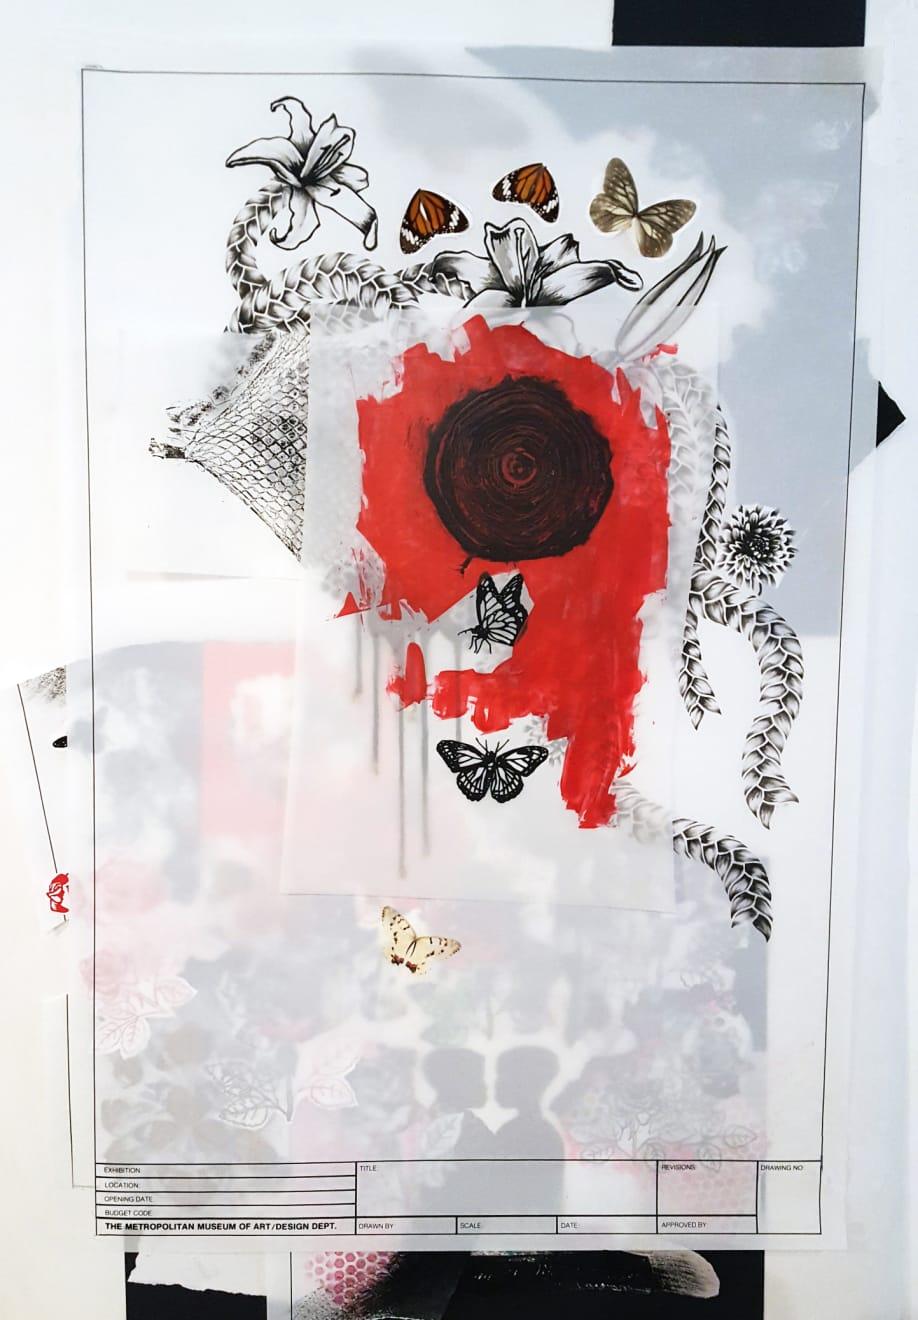 Abby Goodman, Red Spiral, 2019 | Blackbird Gallery